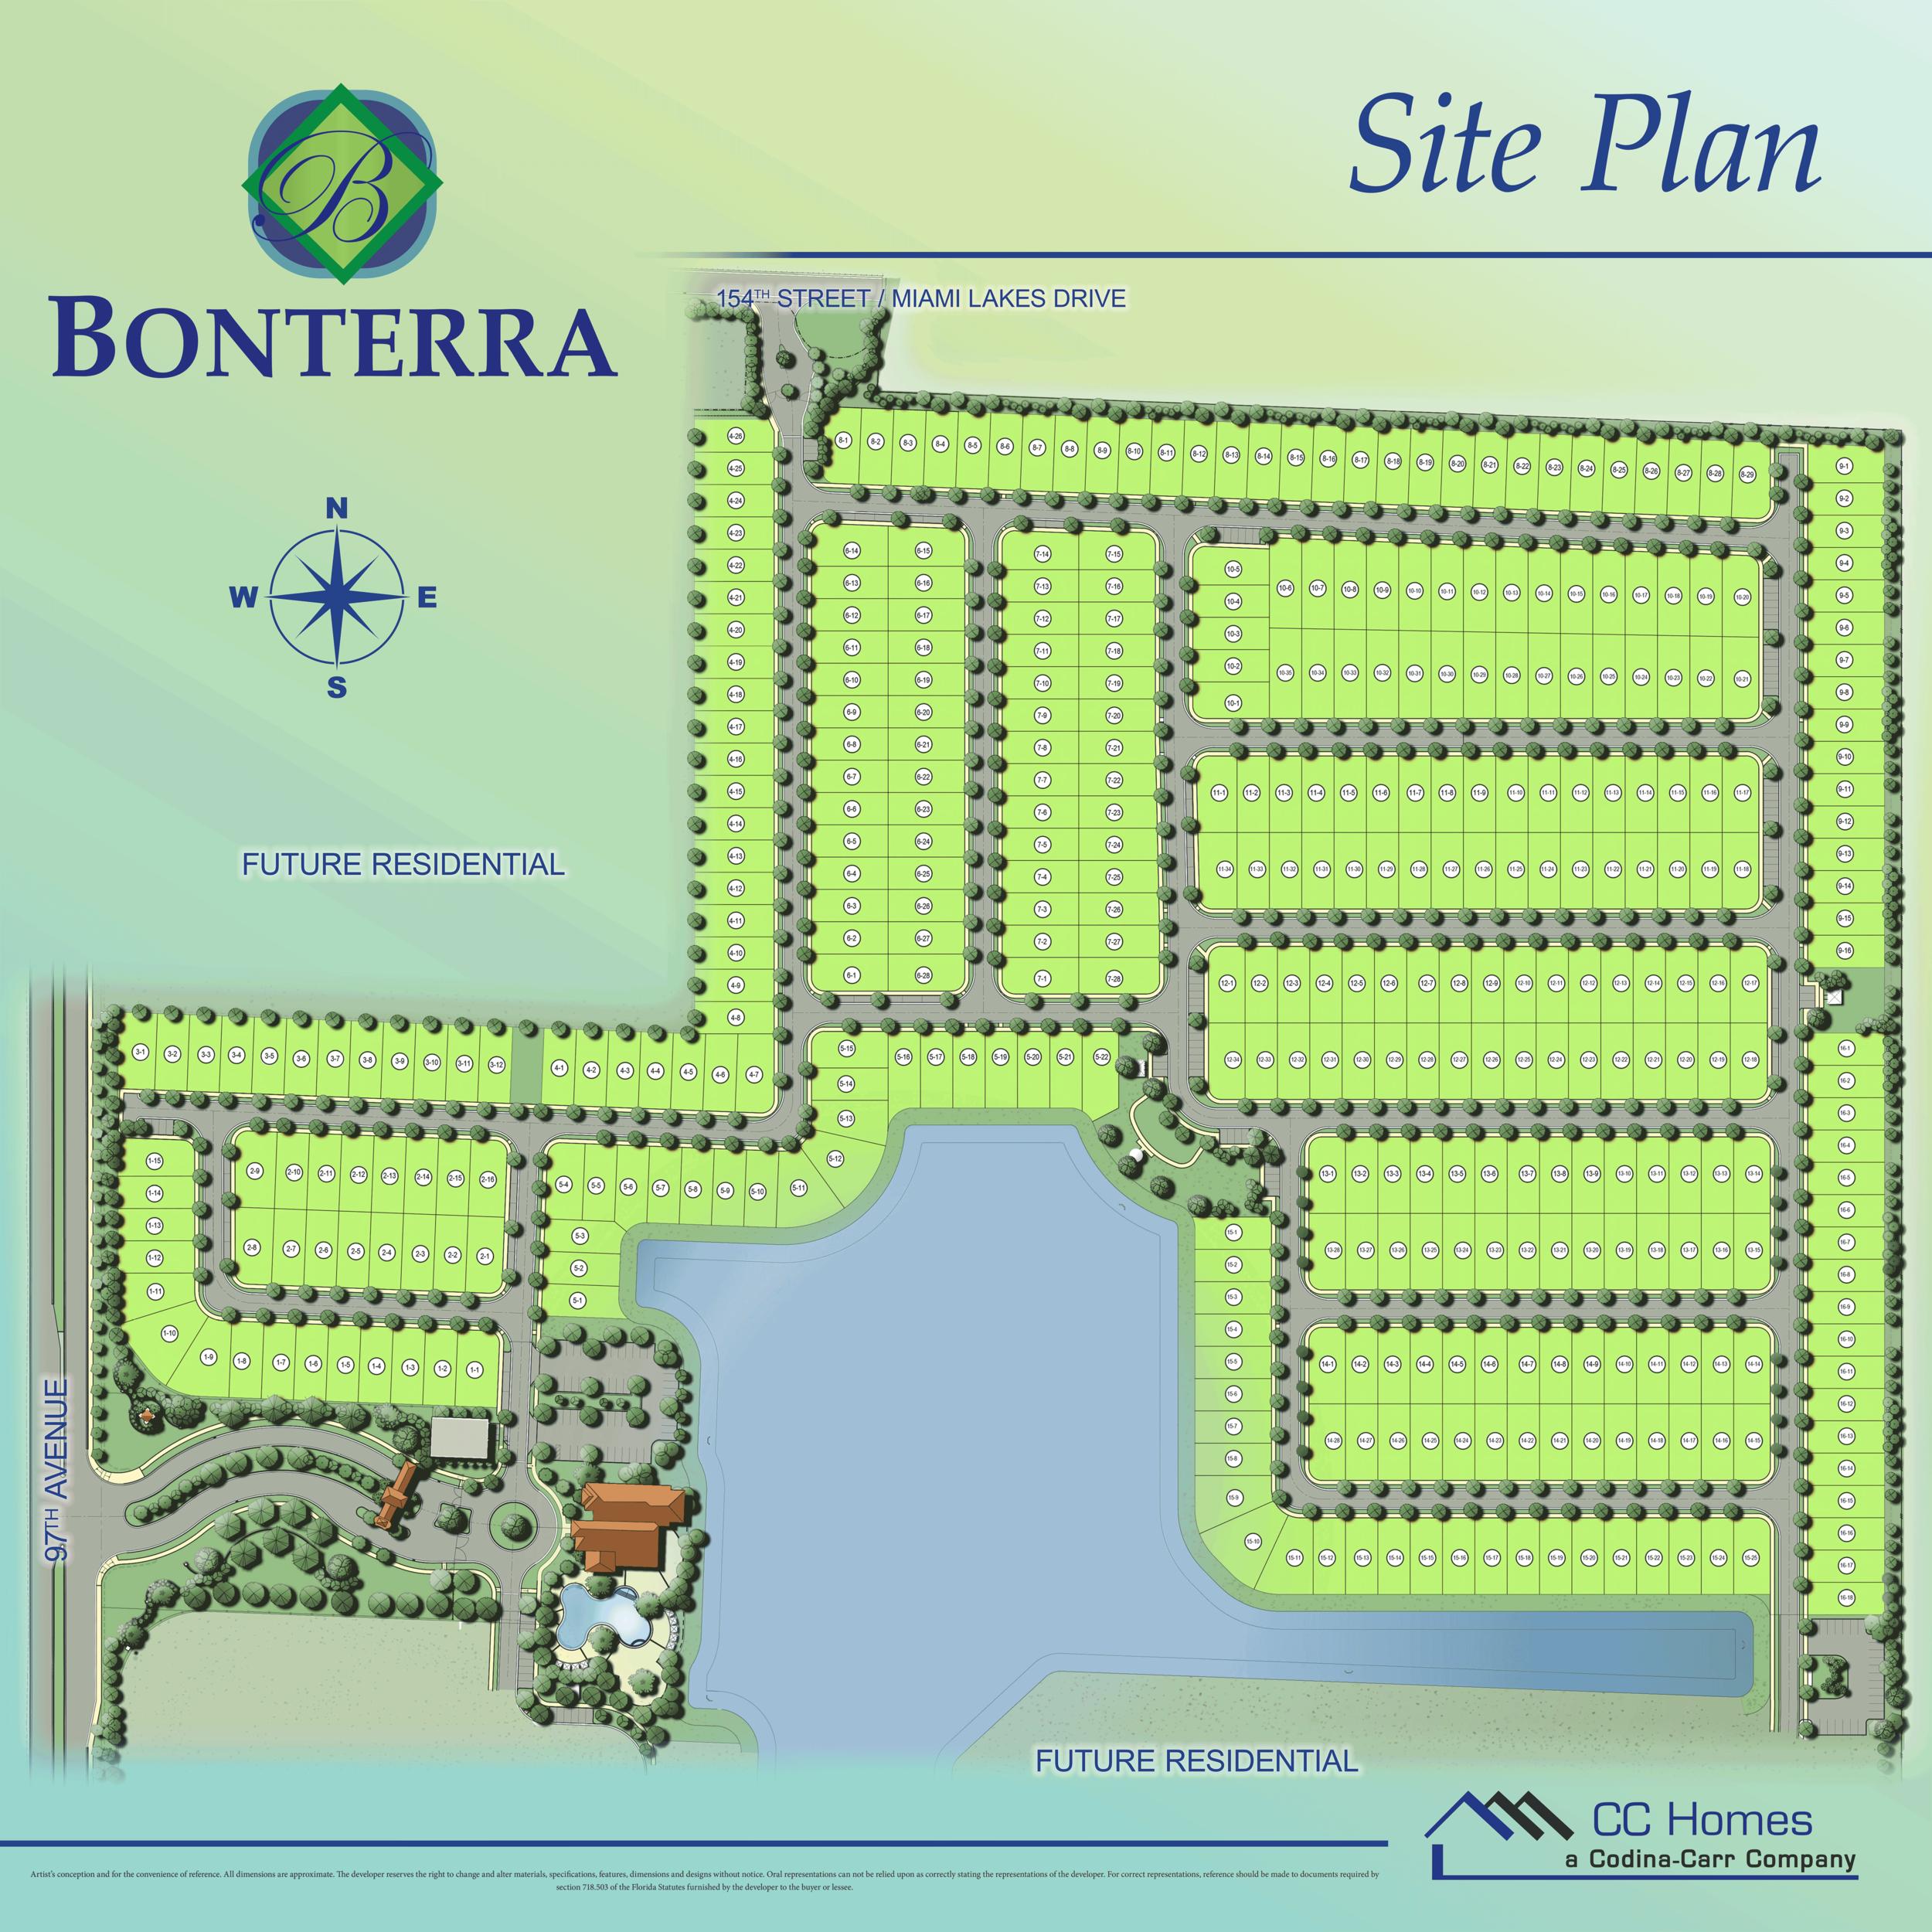 Bonterra site plan